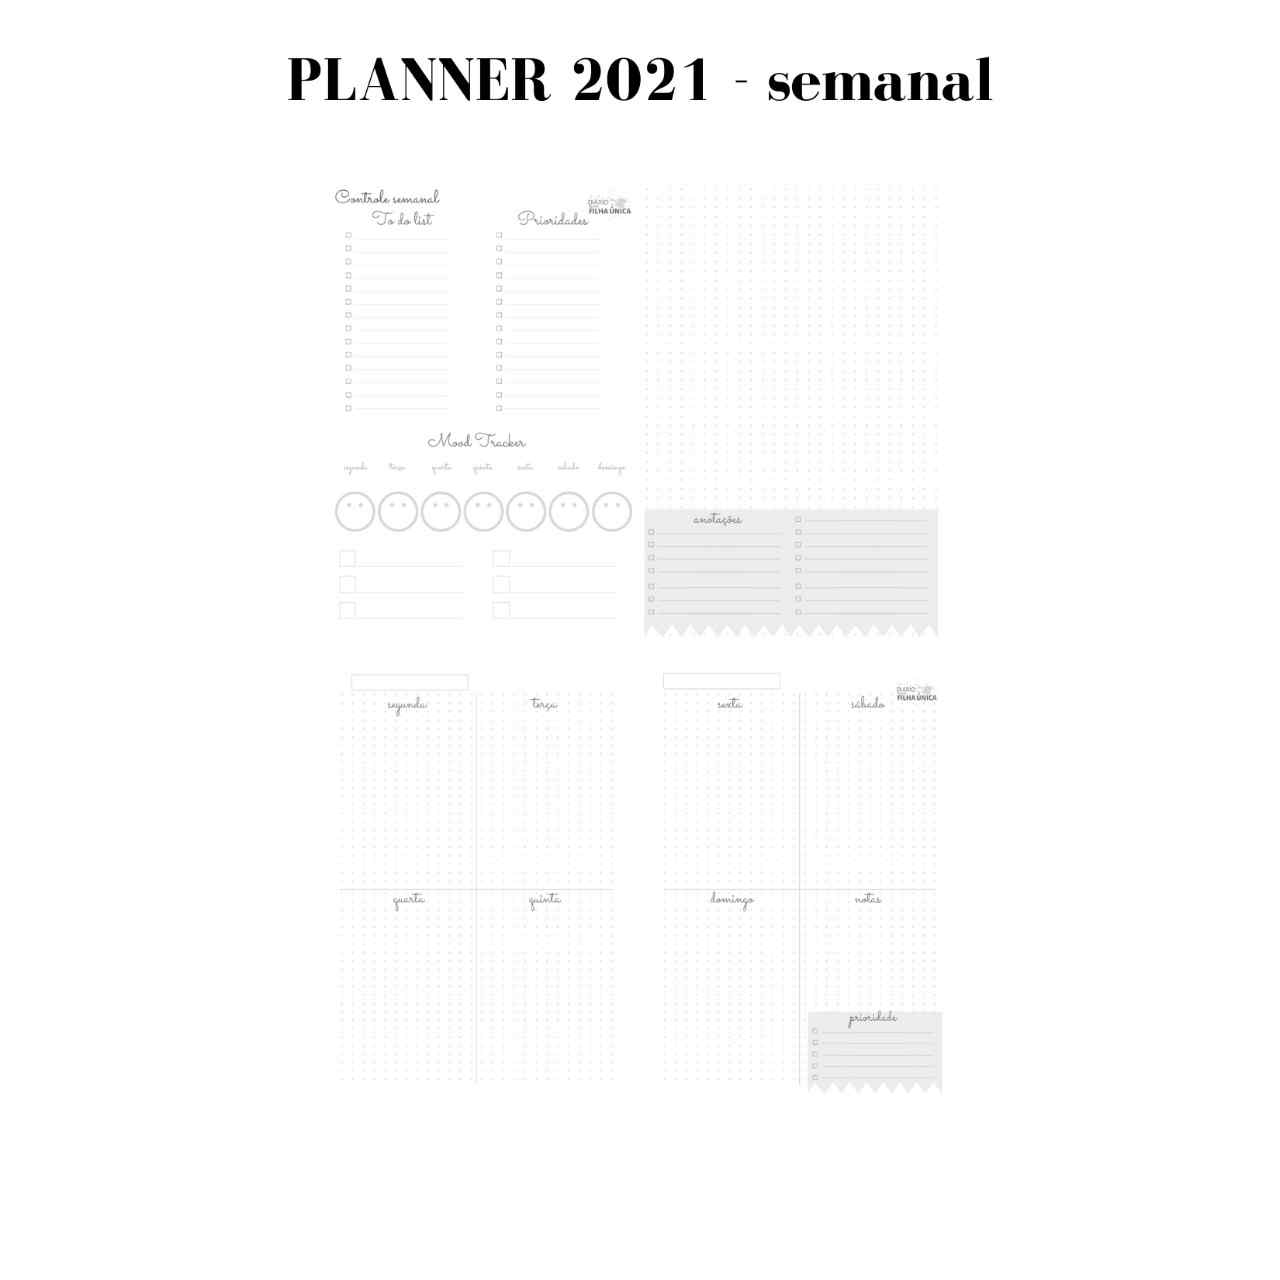 Planner 2021 - You Go Lilás